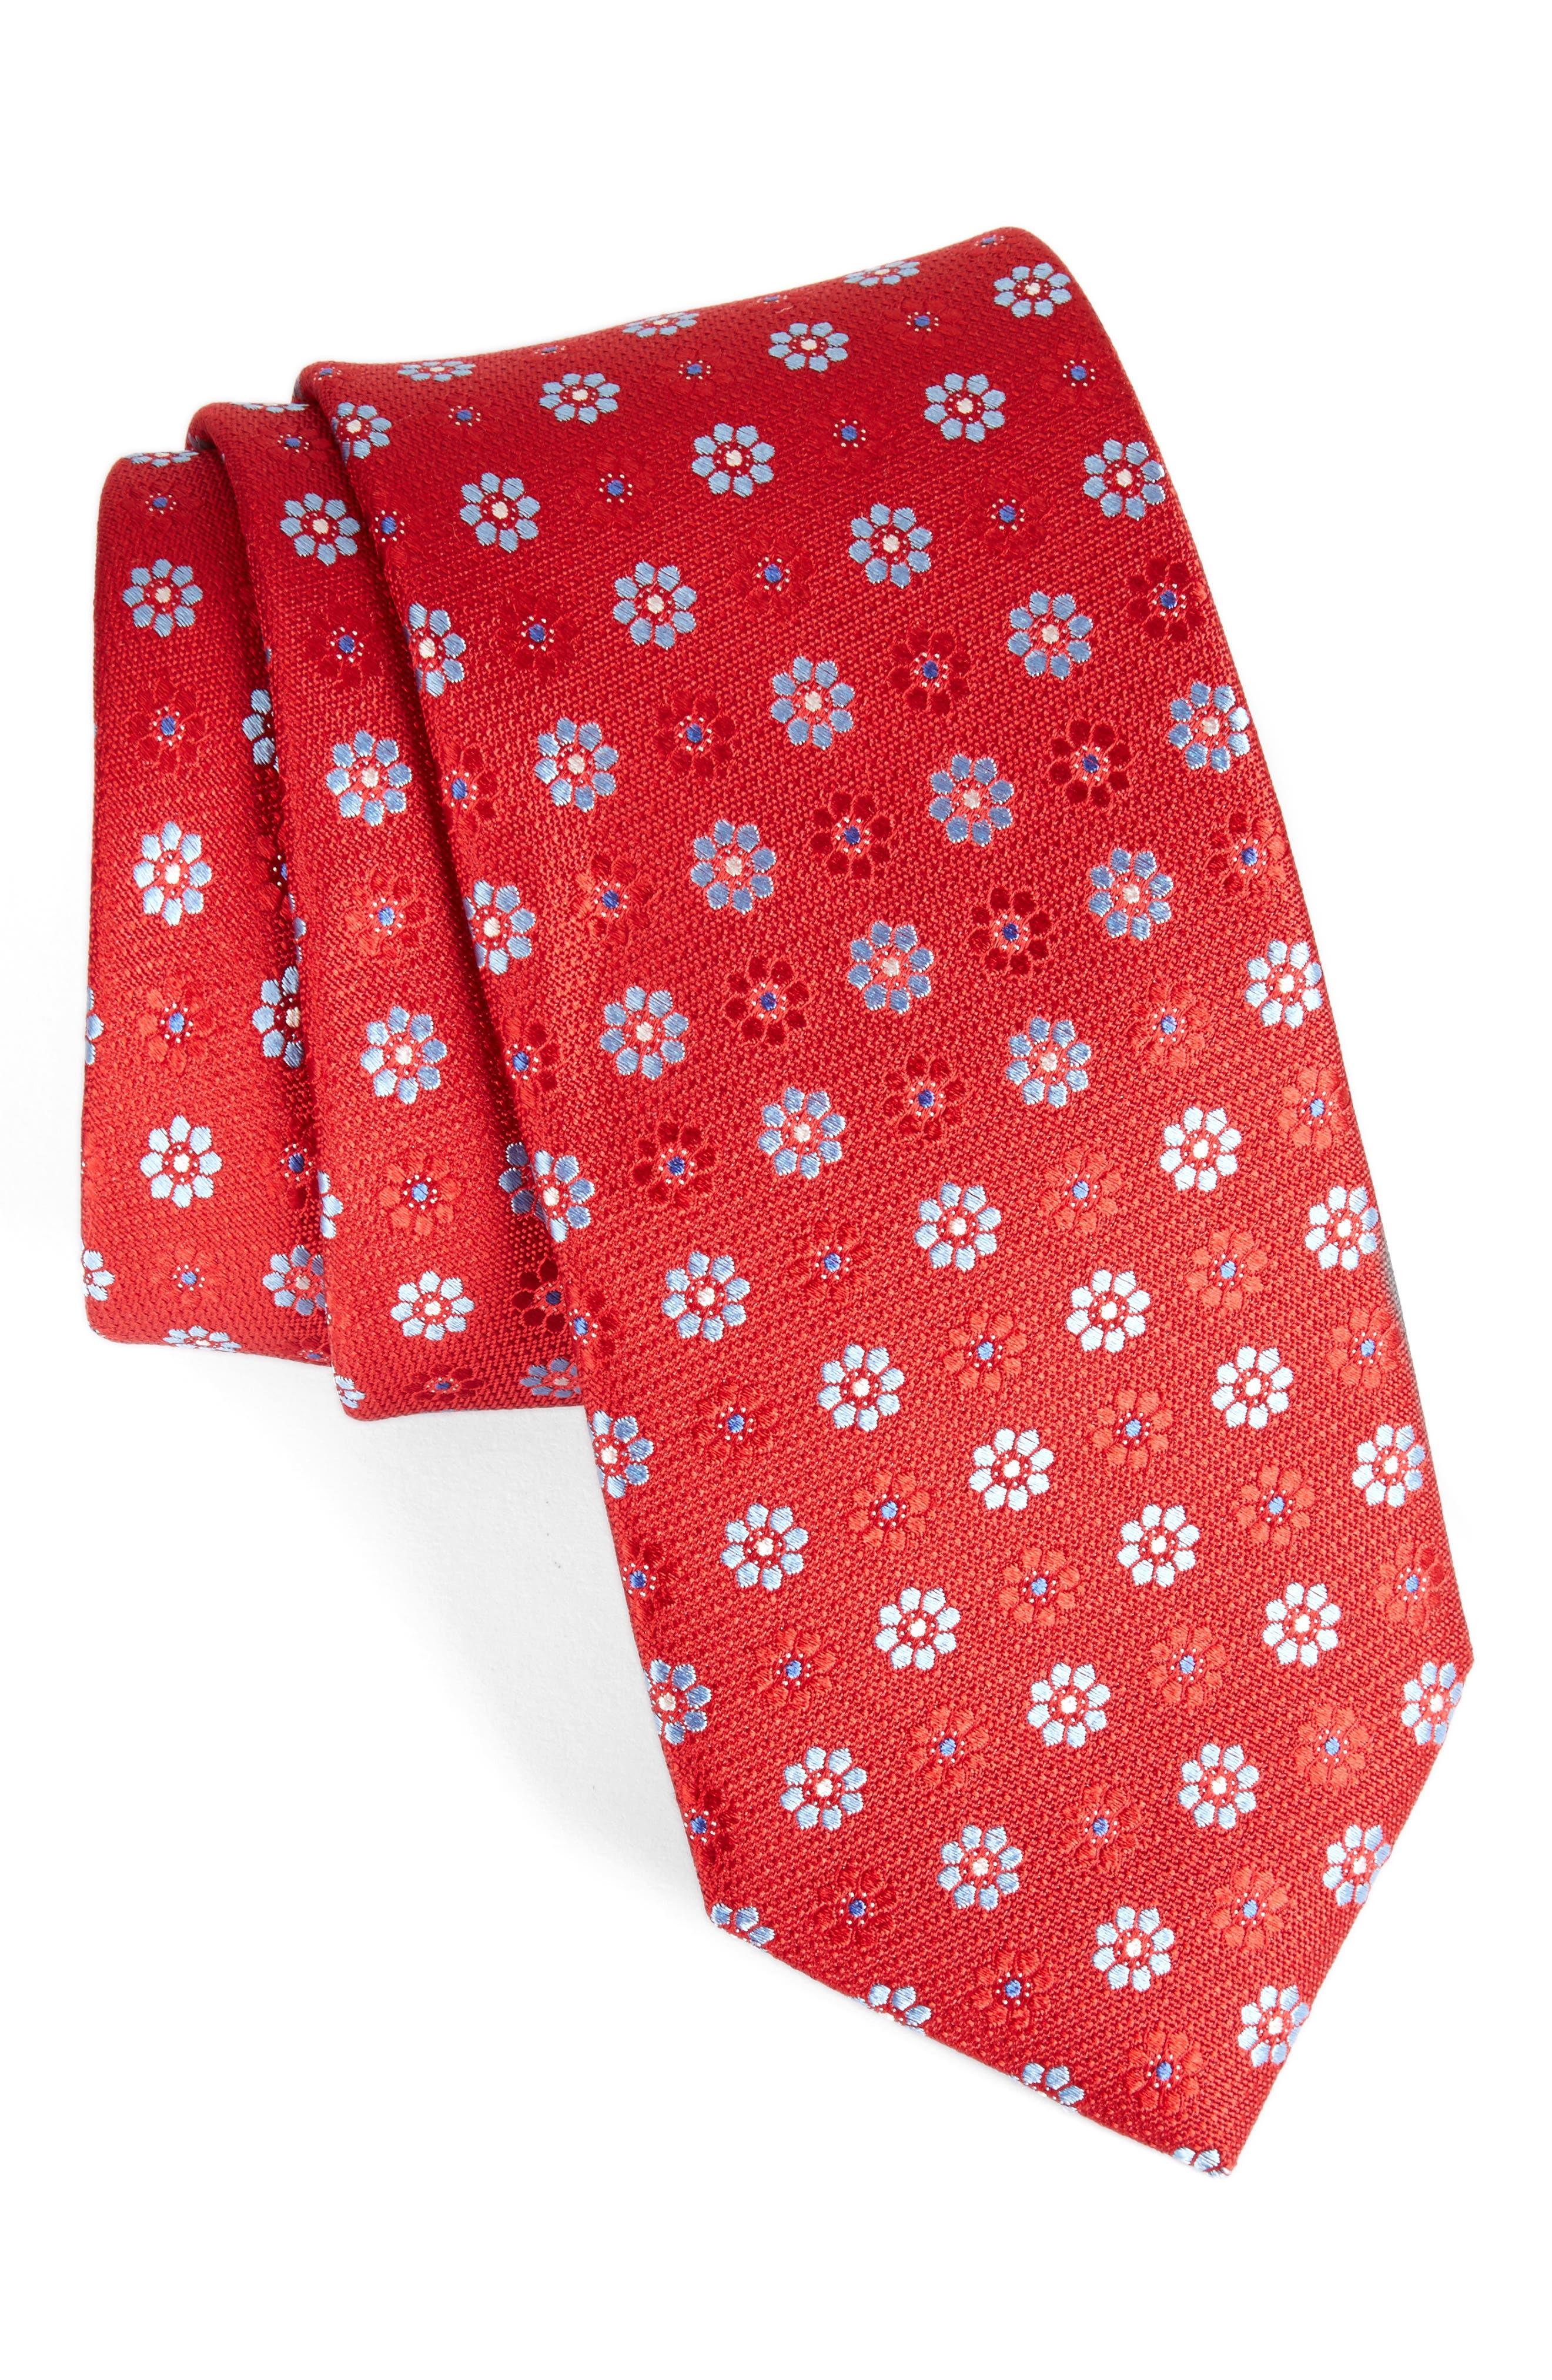 John W. Nordstrom Floral Silk Tie,                             Main thumbnail 4, color,